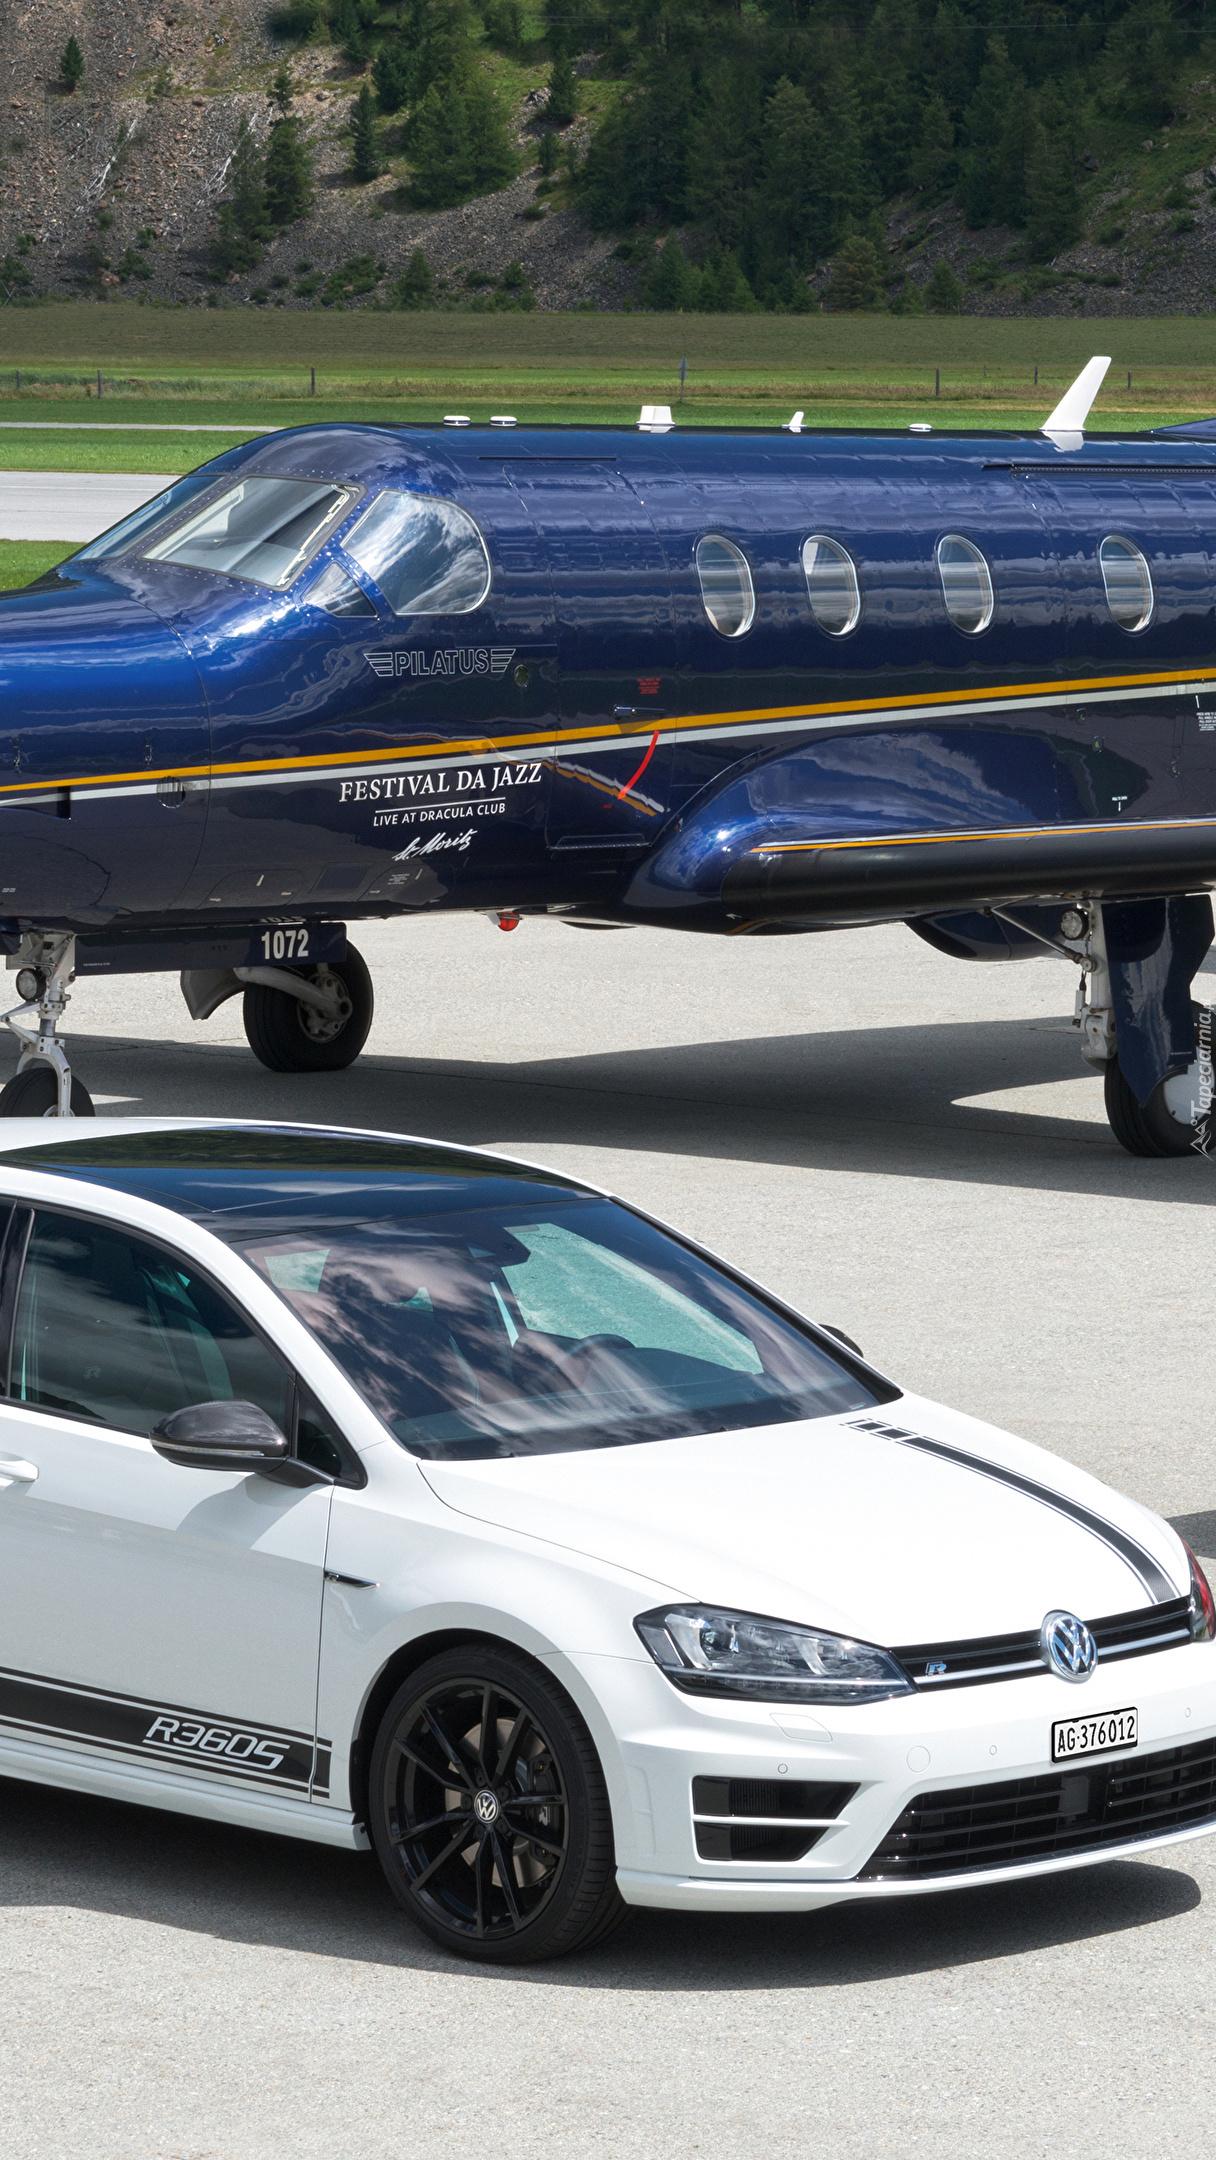 Samolot Pilatus PC-12 i Volkswagen Golf R360S